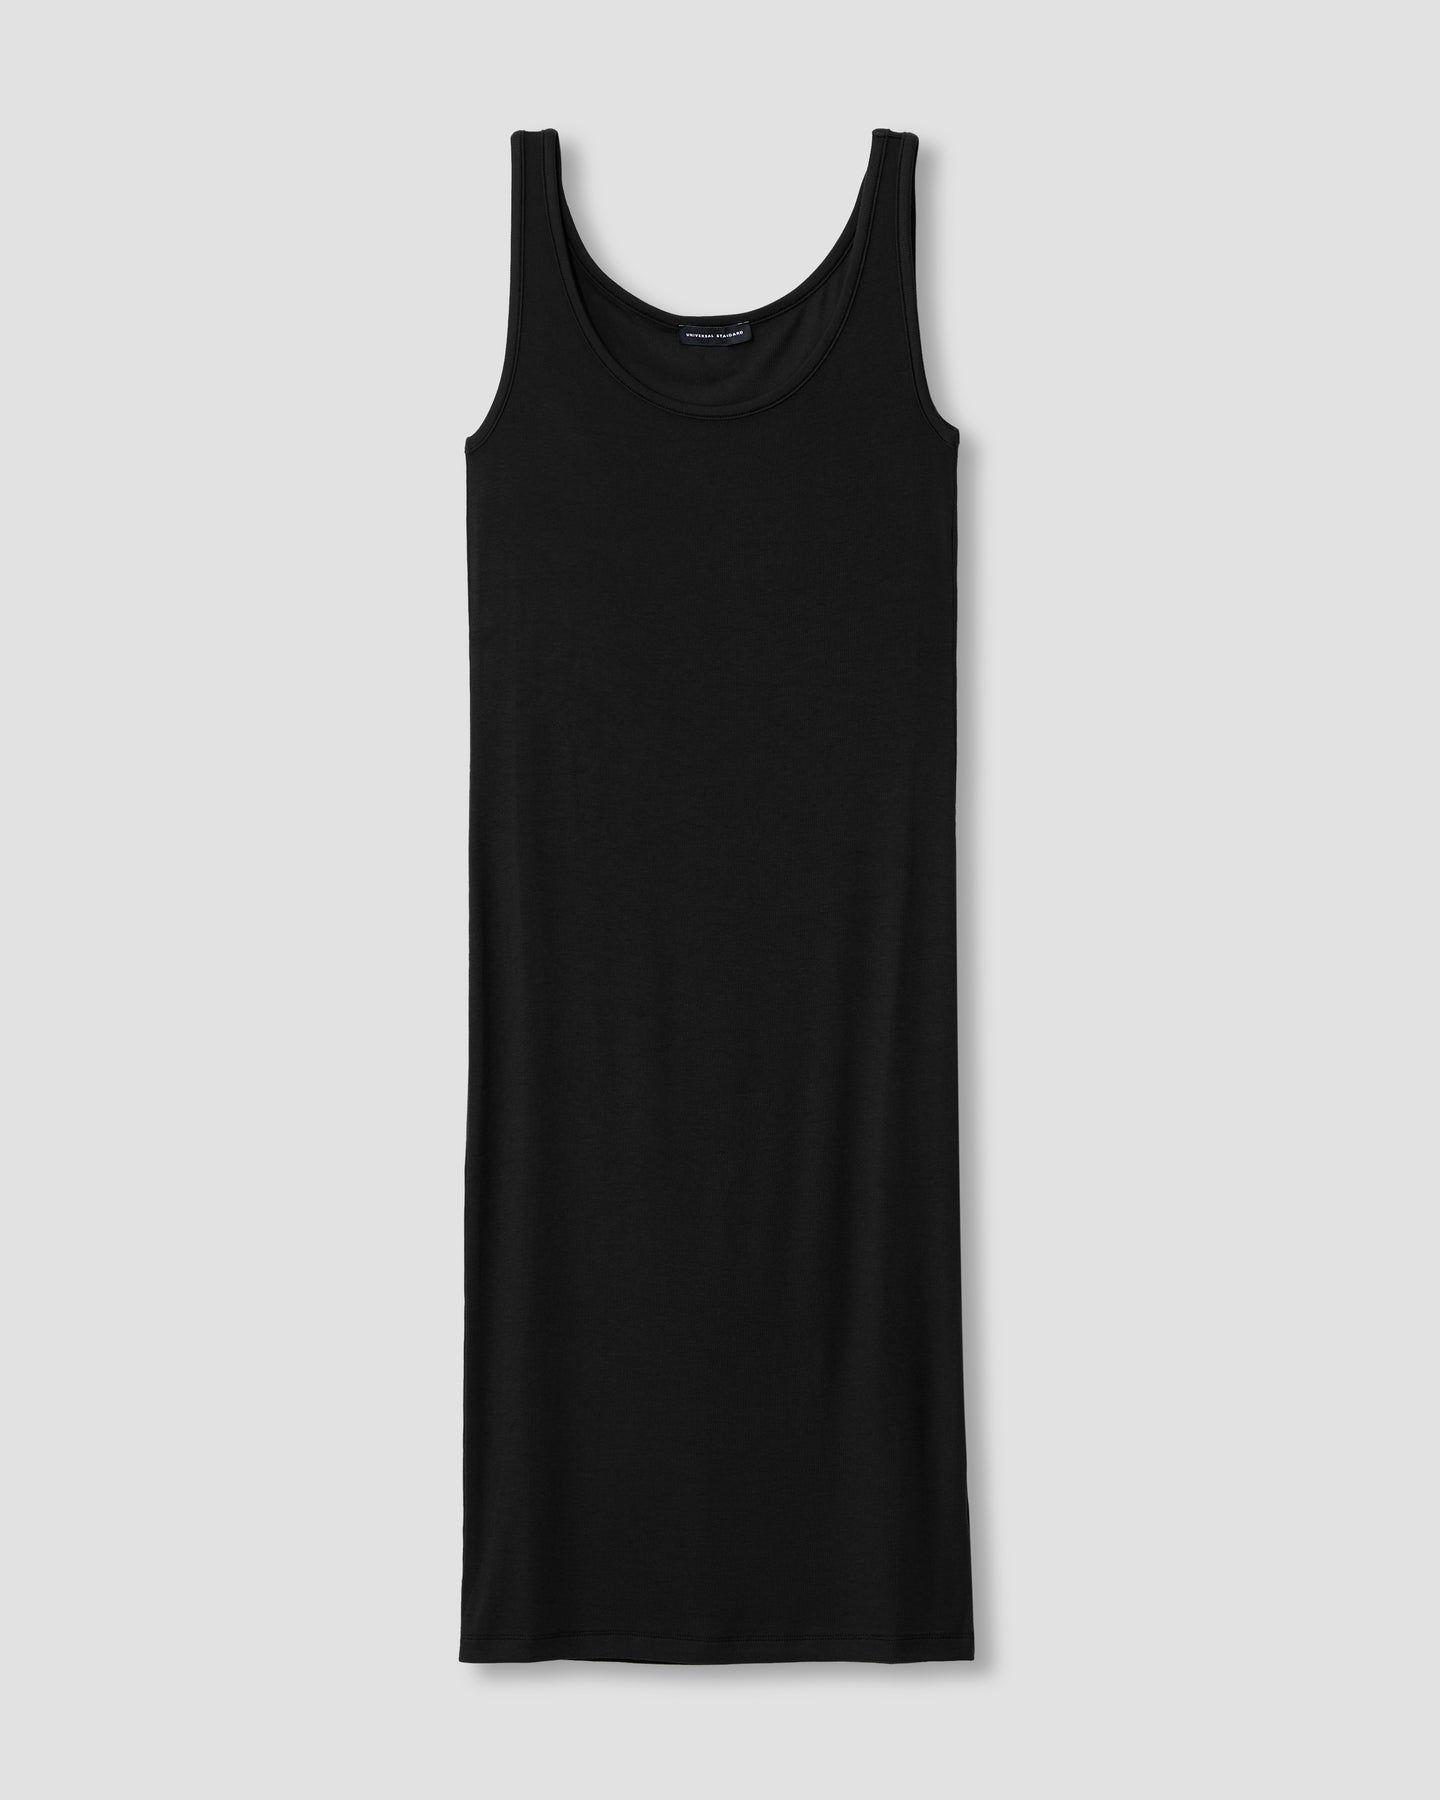 Foundation Tank Dress - Black - image 1